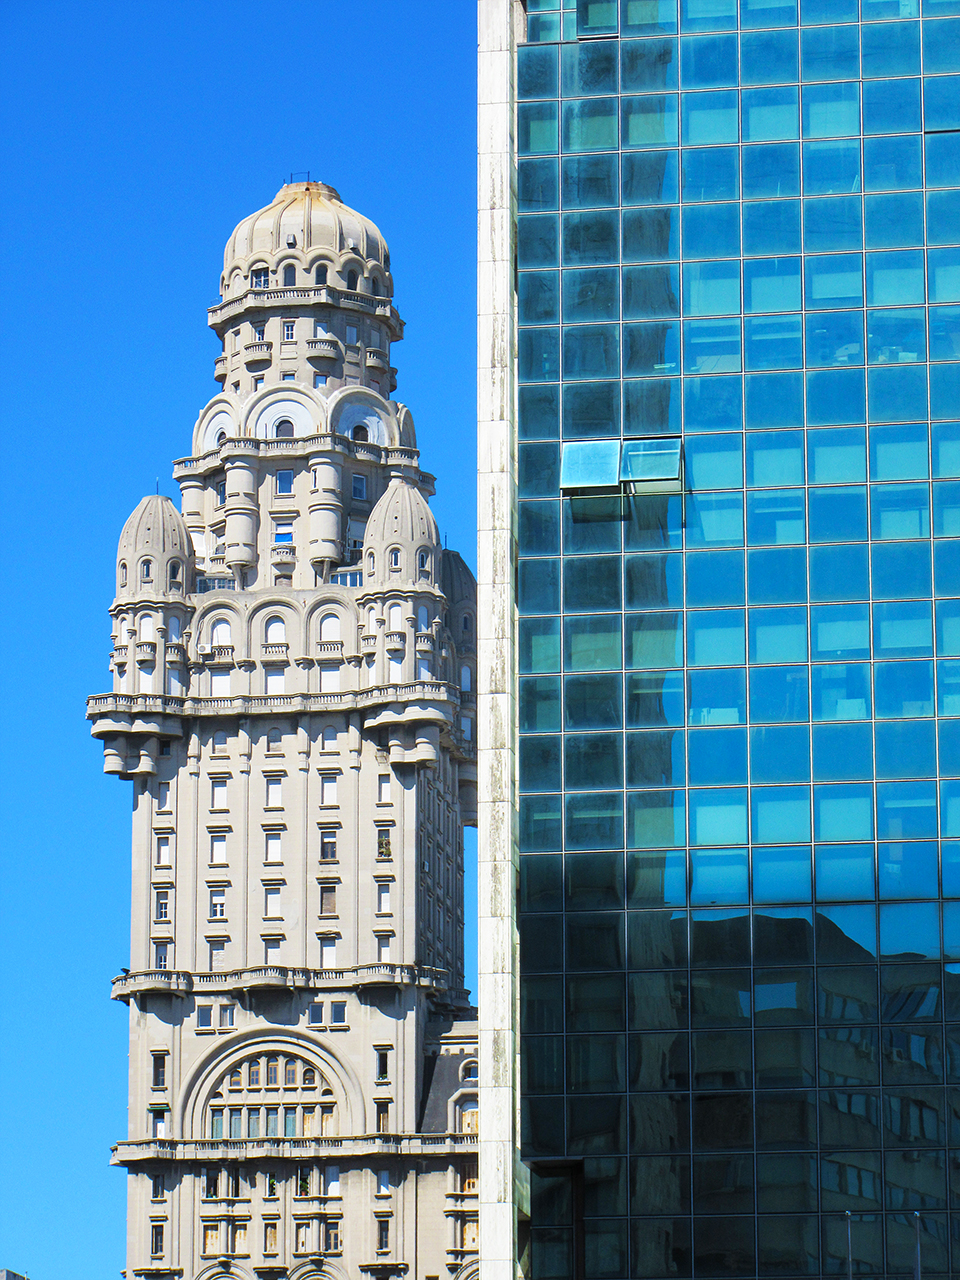 montevideo-ciudad-vieja-travel-postcards-fotografias-uruguay-palacio-arquitectura-latinoamerica-edificios